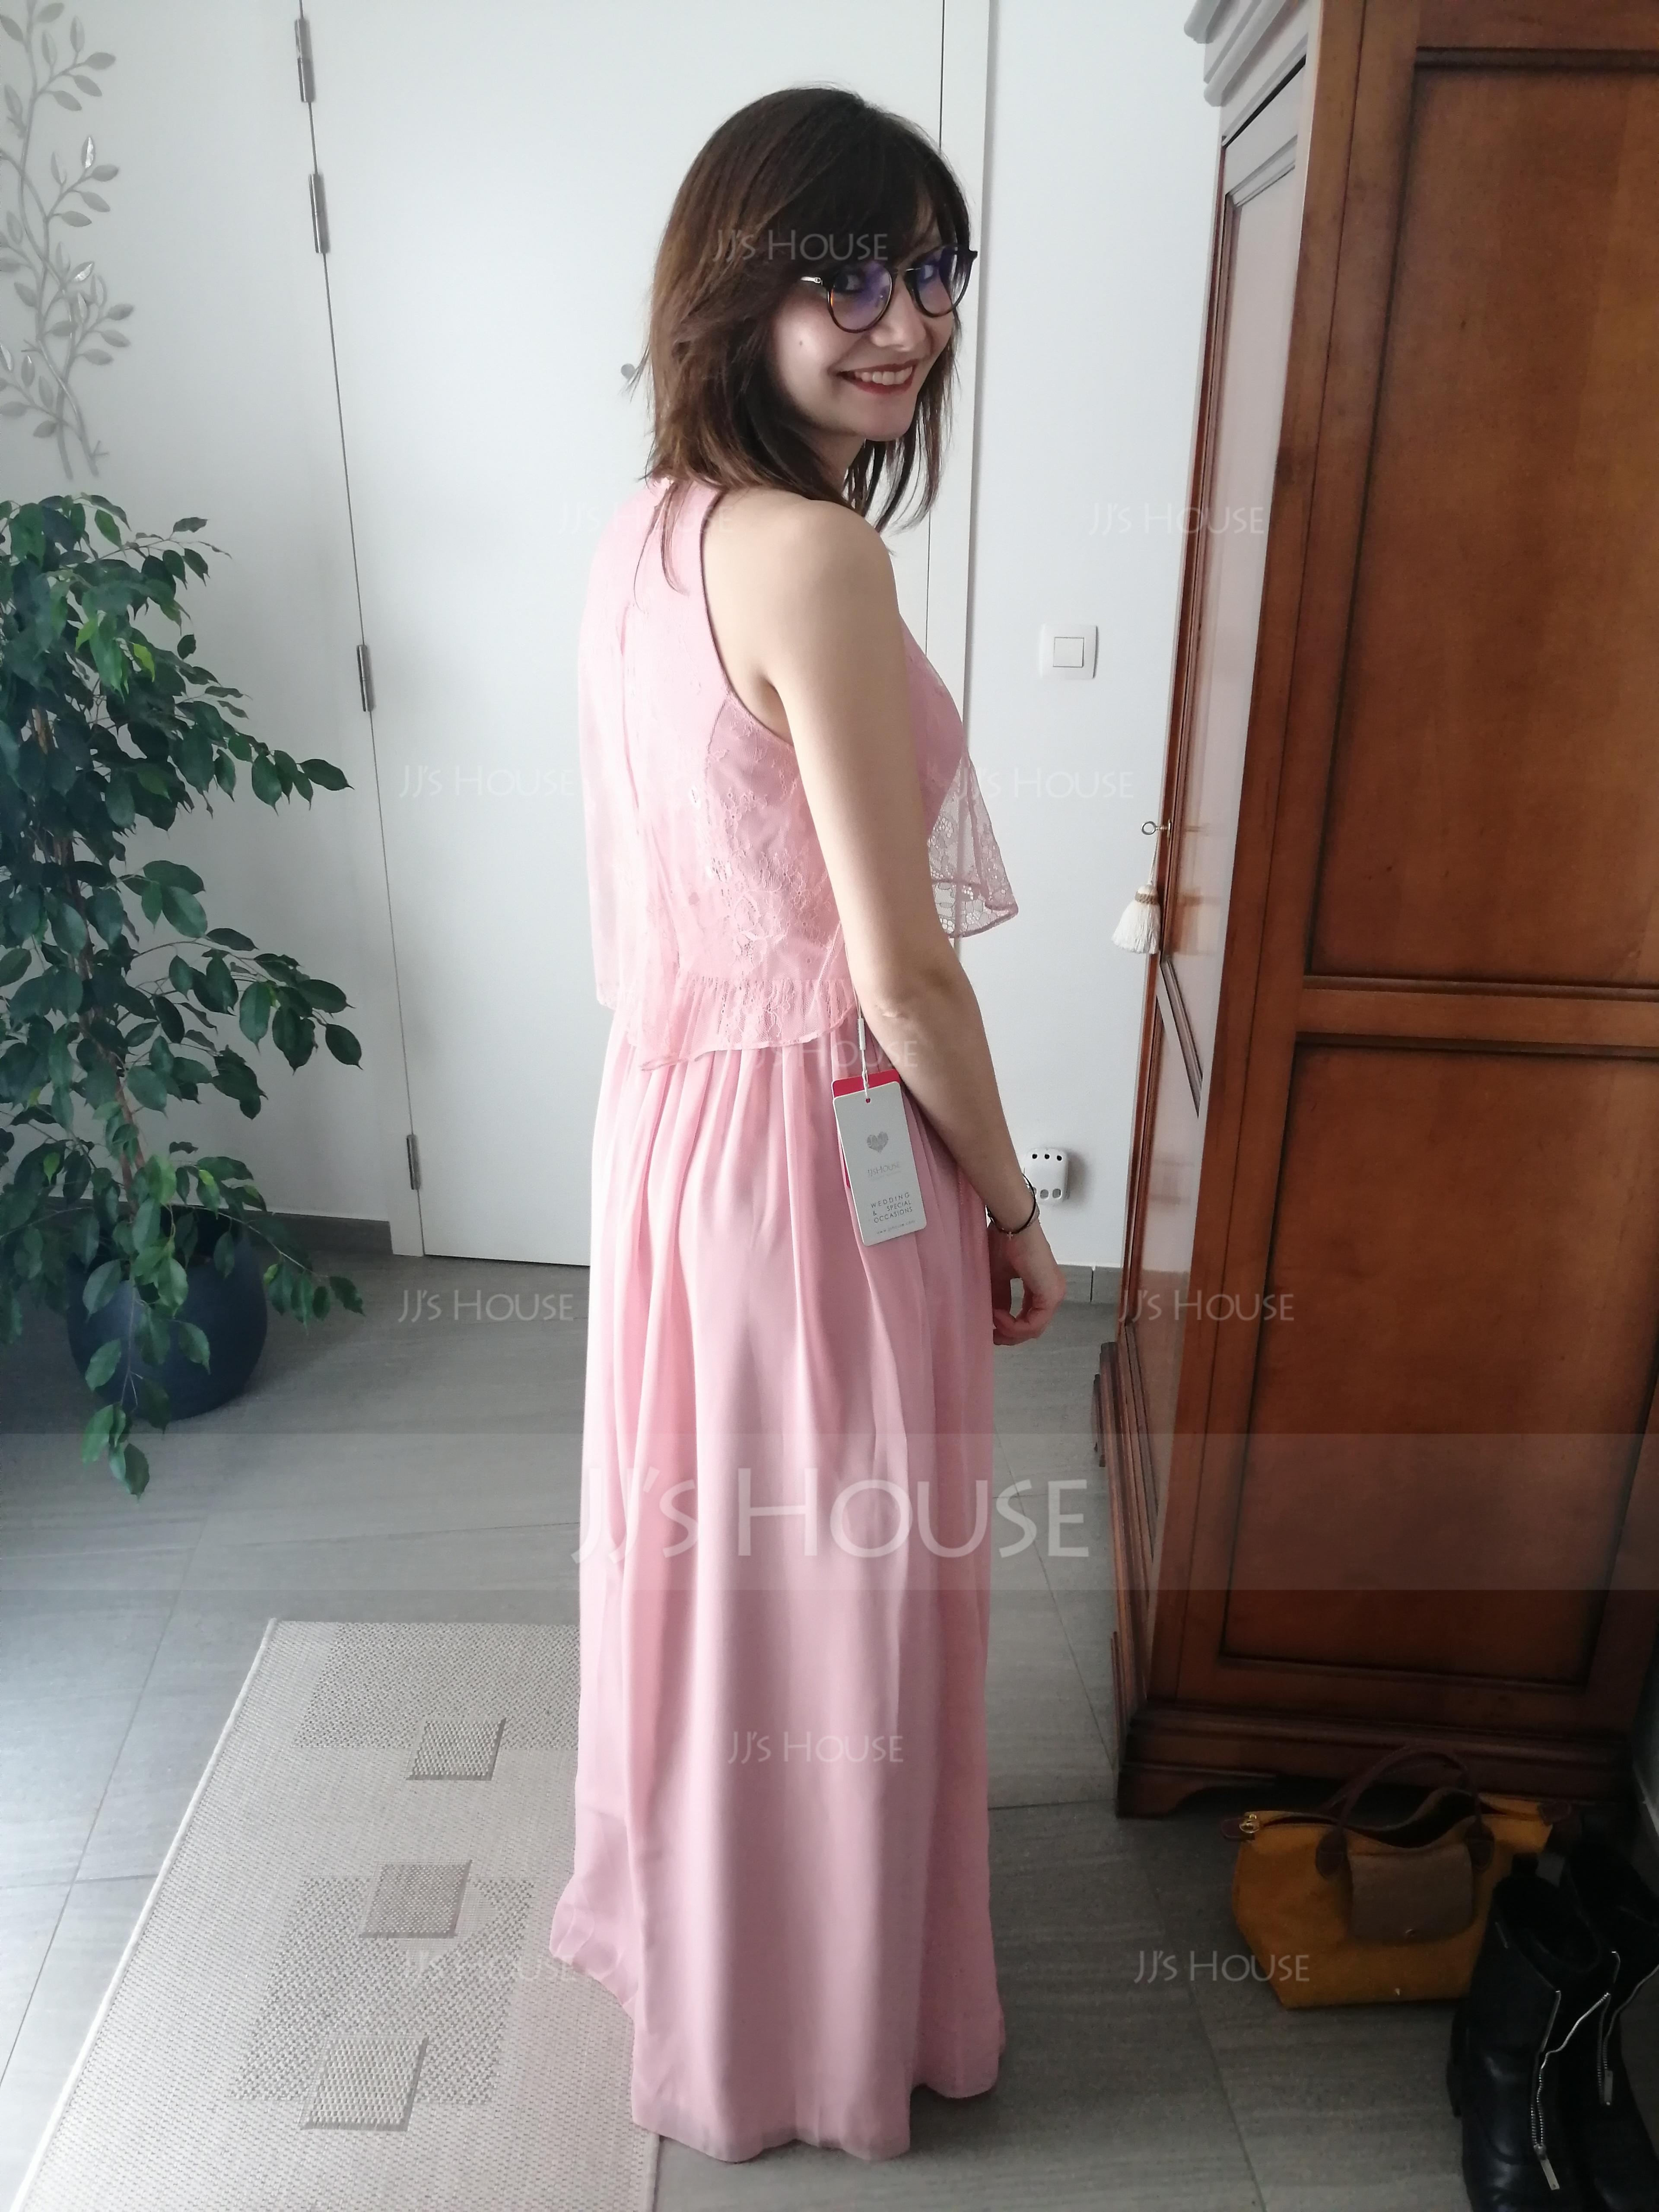 A-Line/Princess Scoop Neck Floor-Length Chiffon Bridesmaid Dress With Ruffle (266176991)